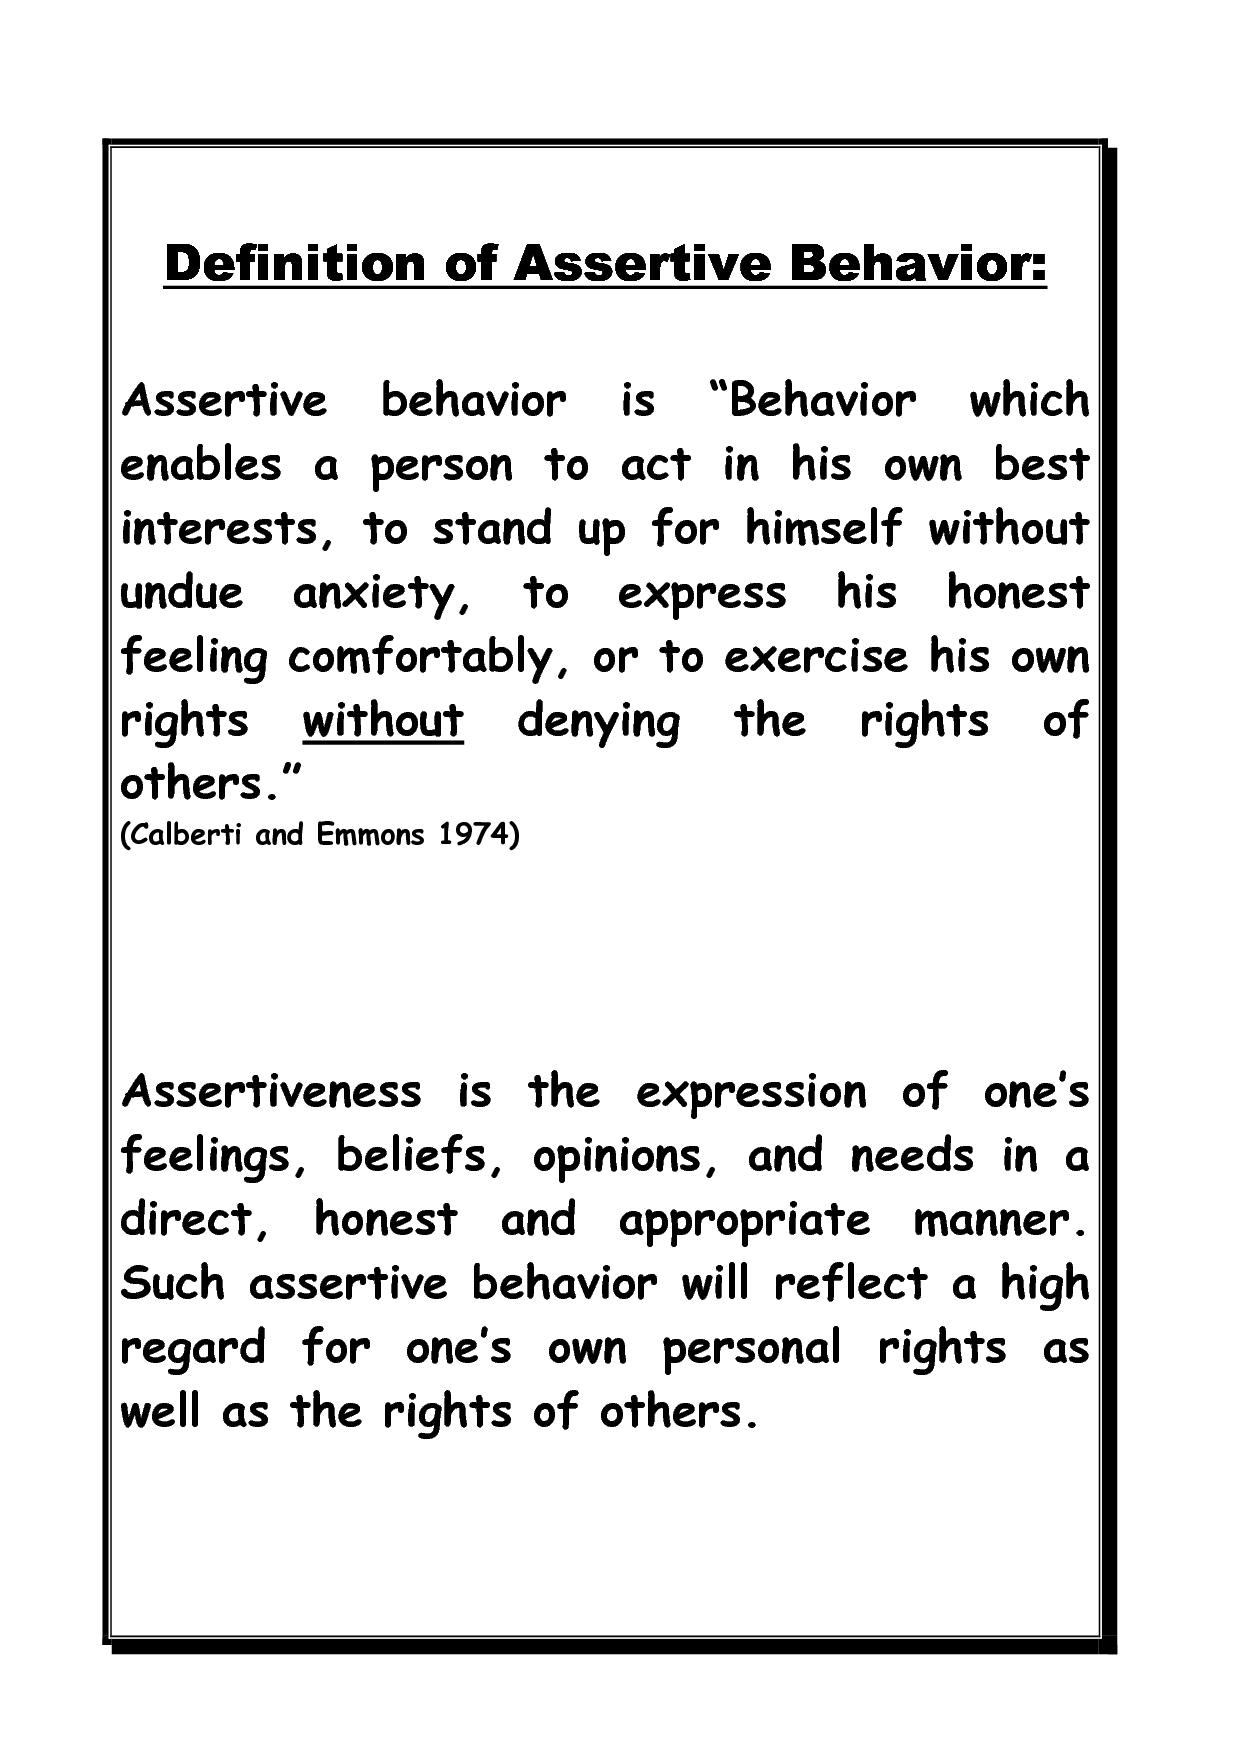 a good, working definition of assertiveness. www.redbridge-iae.ac.uk